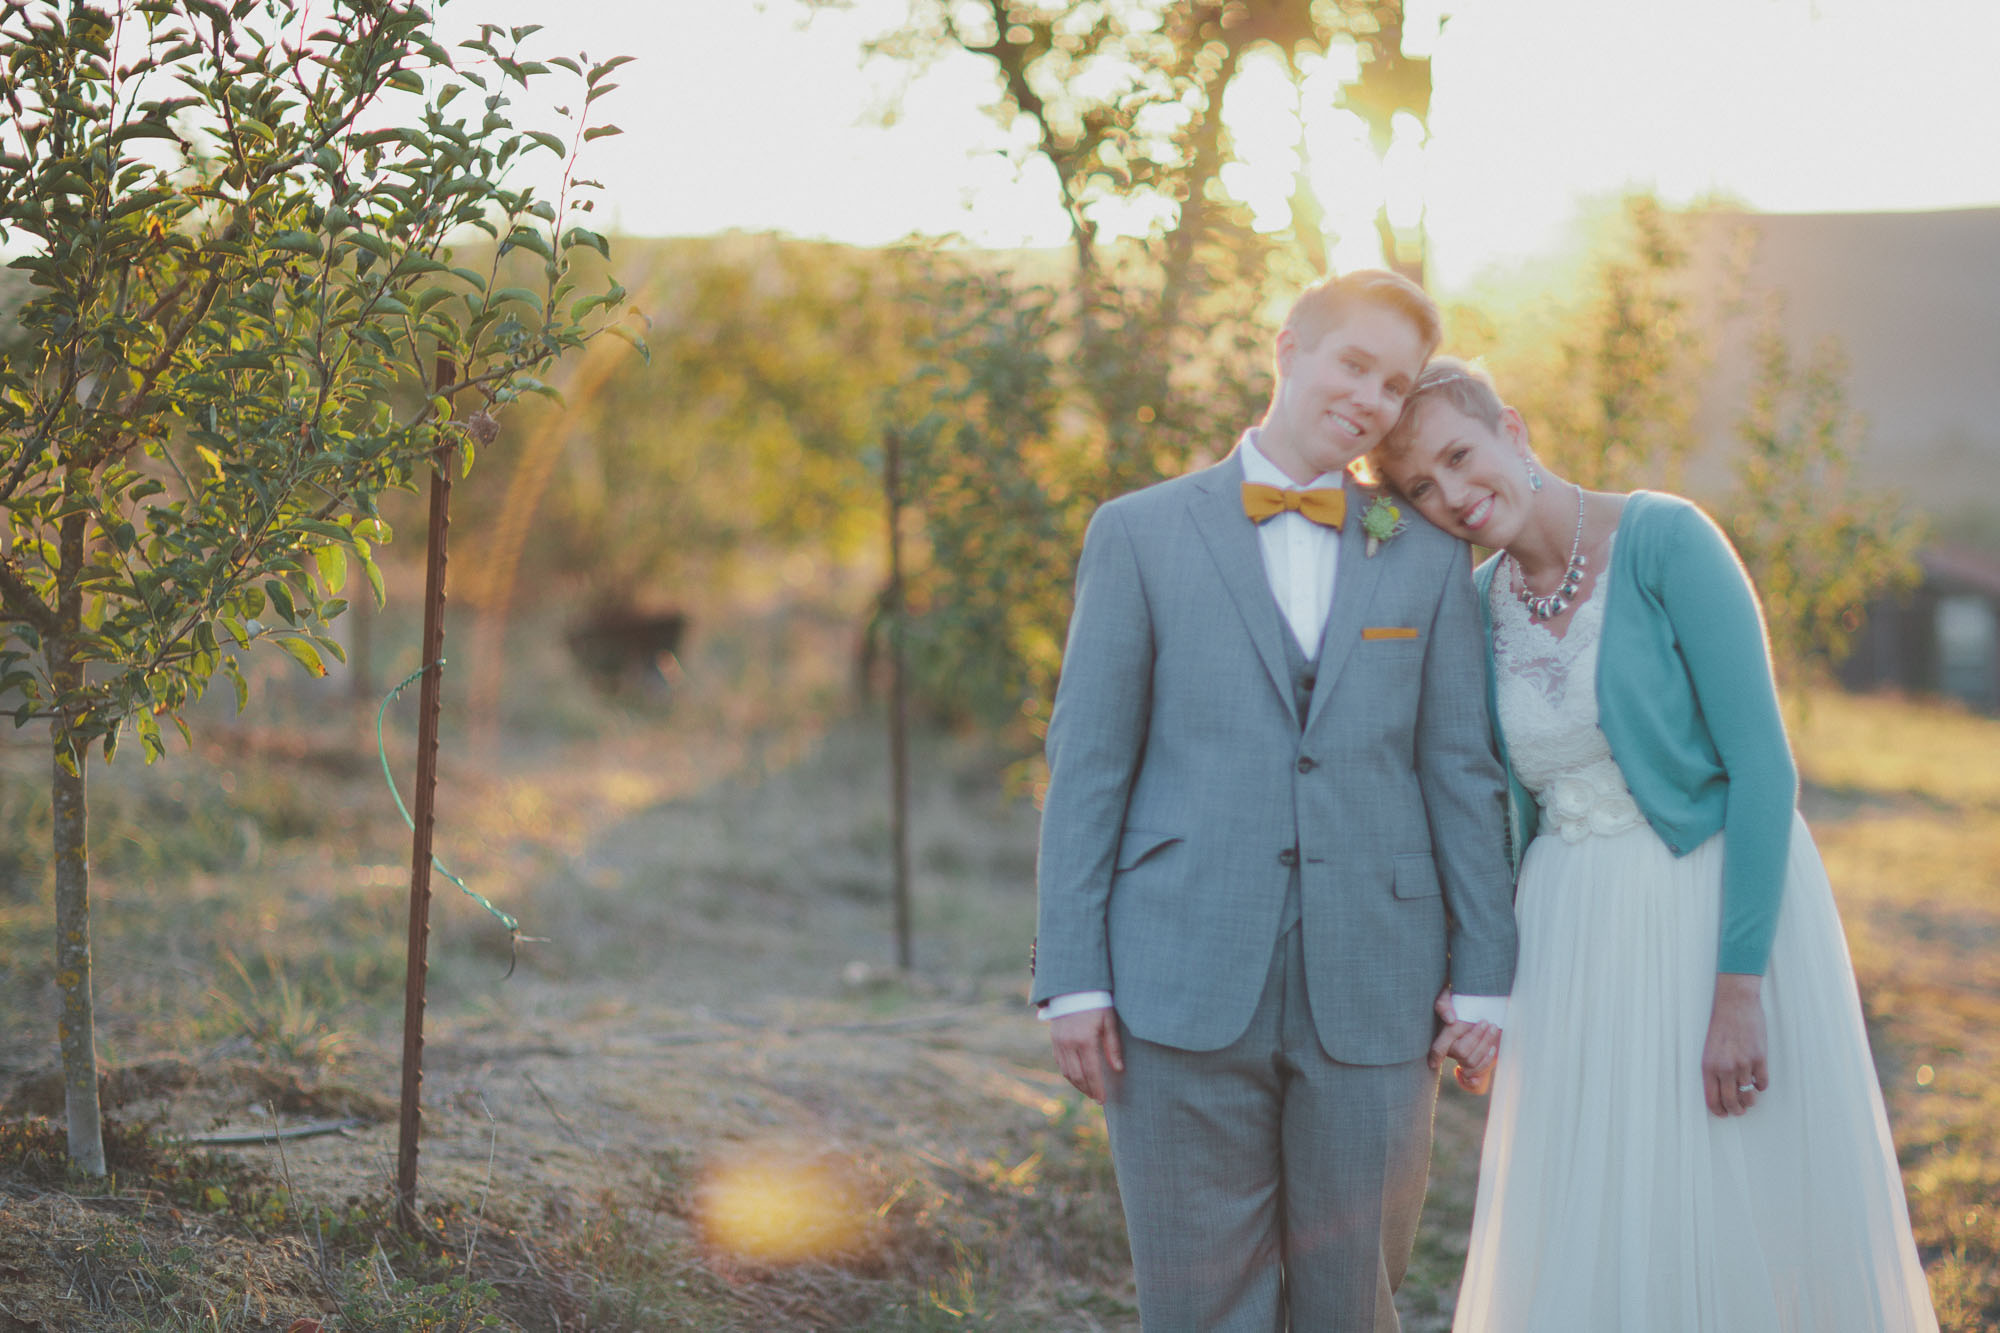 Gretchen_Gause_Petaluma_Olympias_Valley_Wedding_Photo-196.jpg